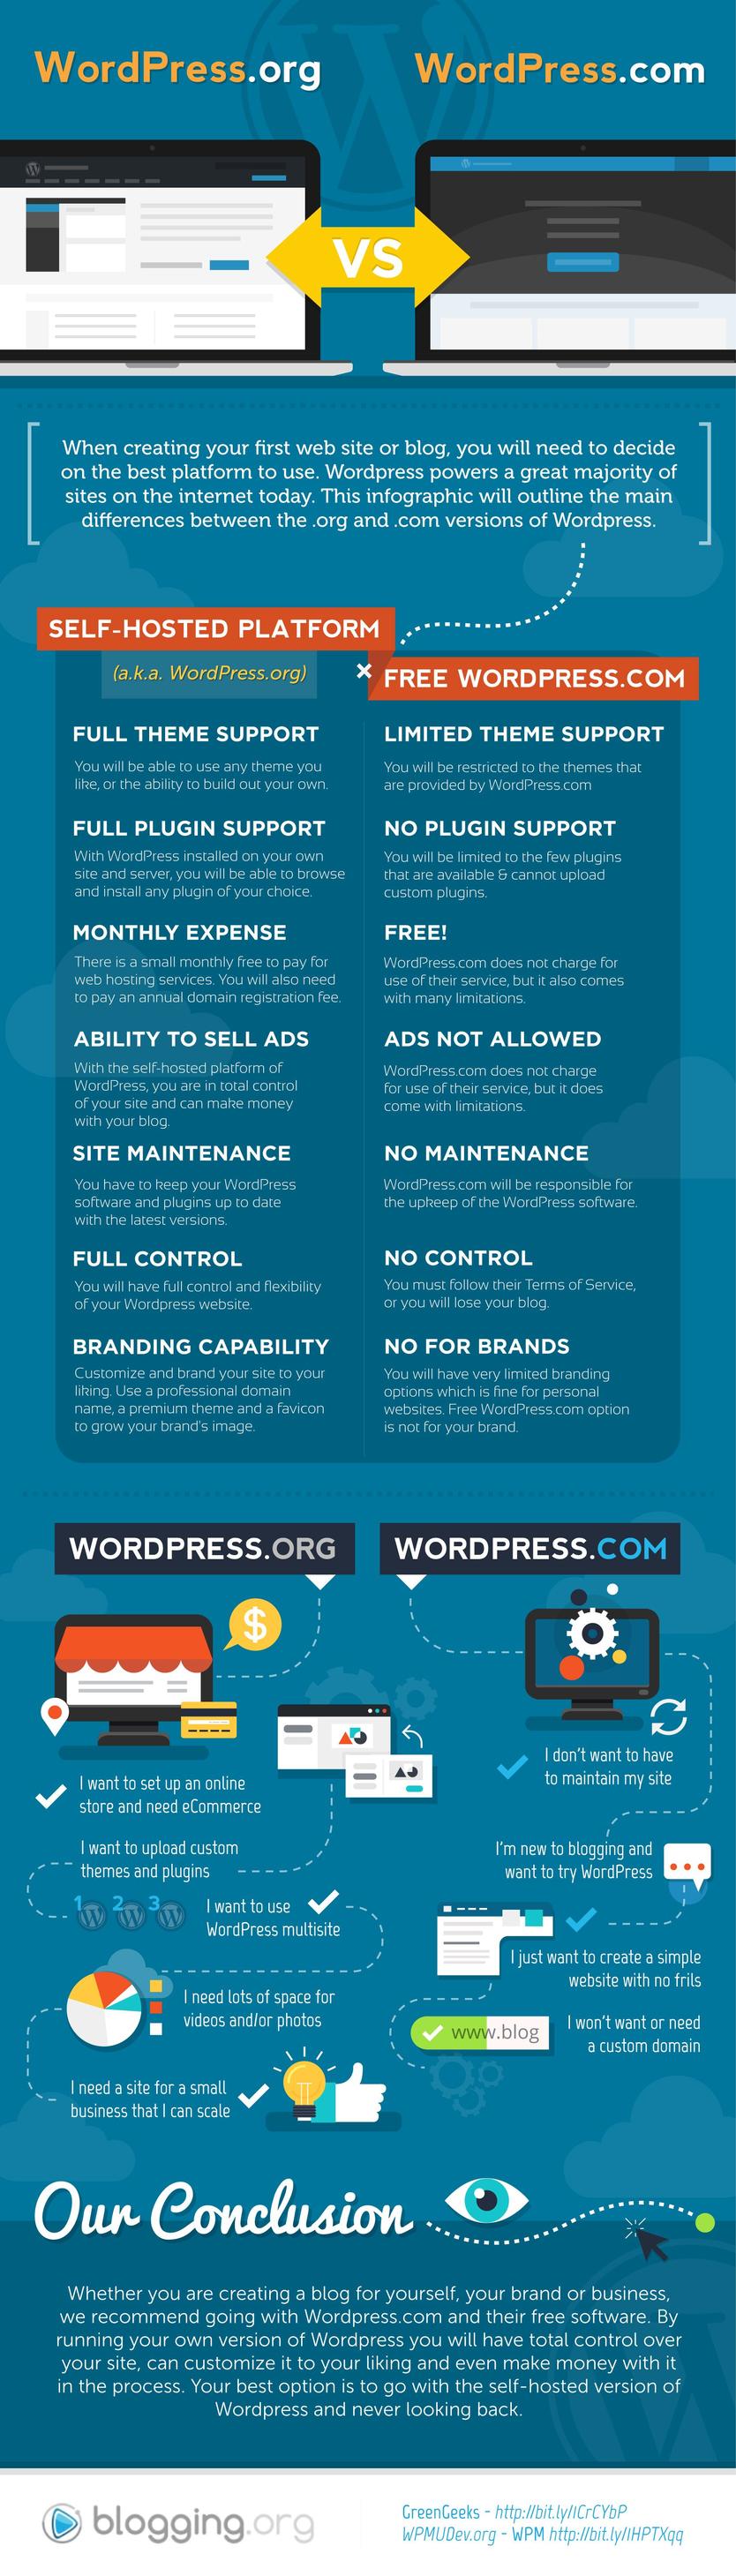 Which wordpress platform is best for me.